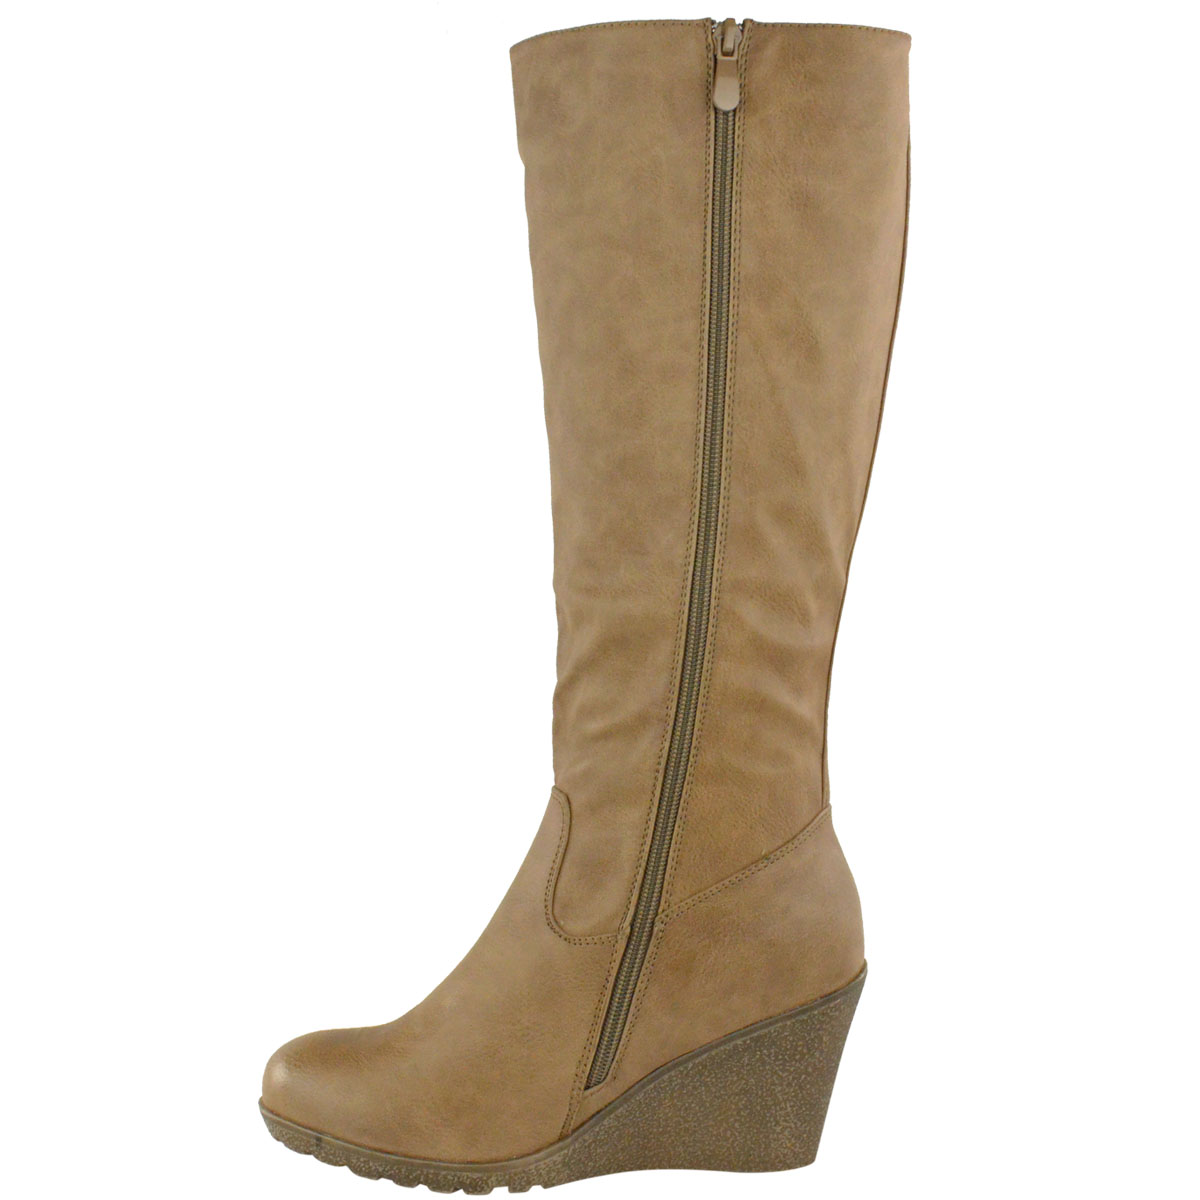 Womens-Ladies-Wedge-Low-Heel-Winter-Knee-Boots-Warm-Faux-Fur-Fleece-Size-UK thumbnail 18